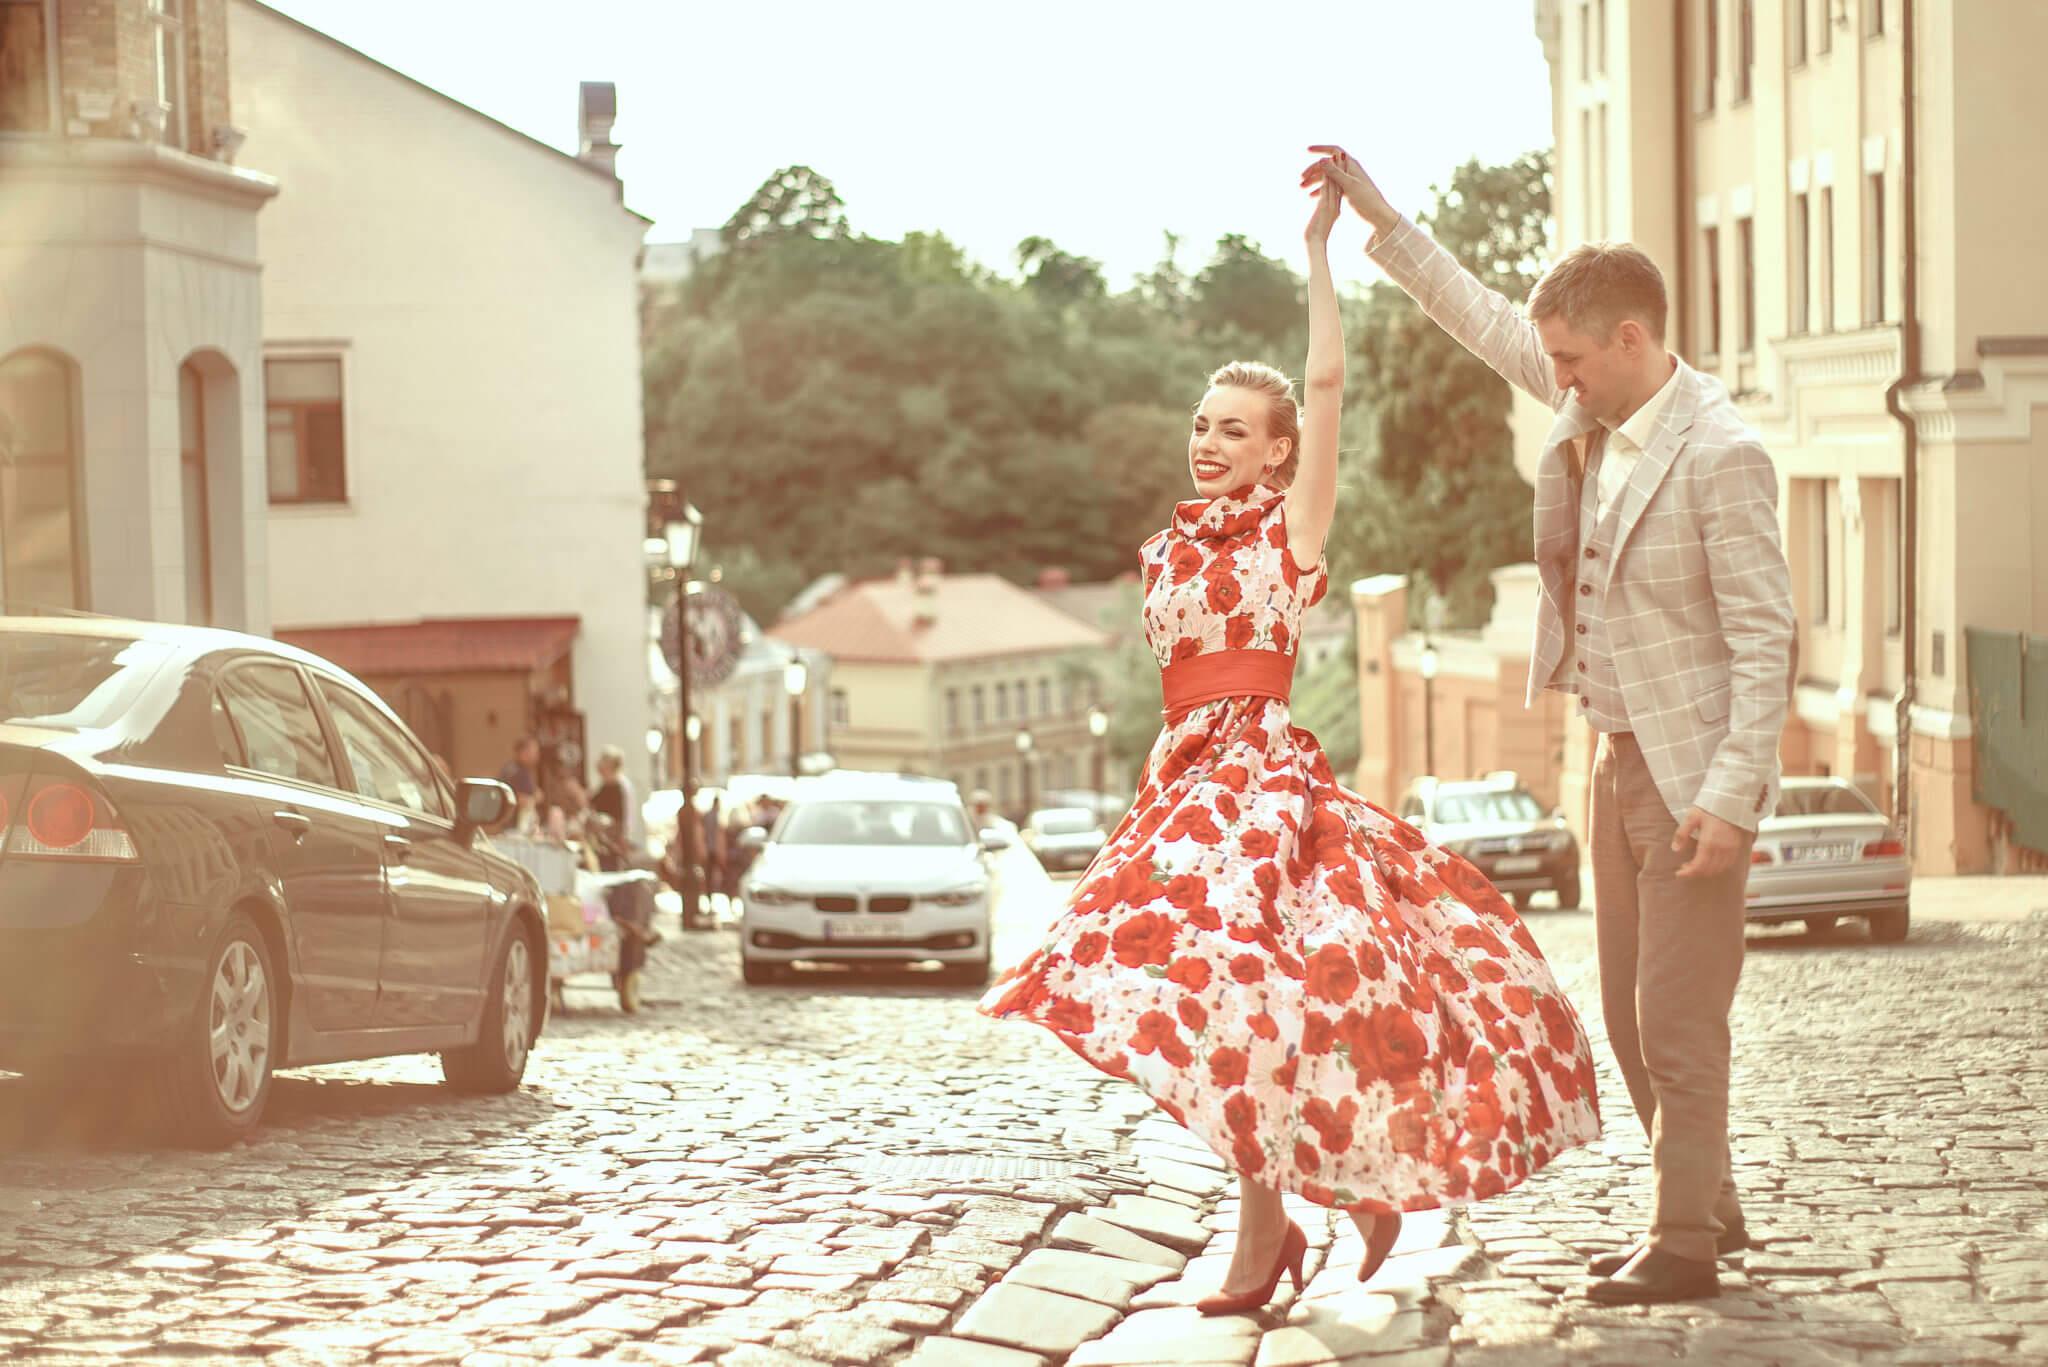 Love Story на природе, прогулка по городу, Андреевский спуск, закат, пара кружится в танце, ph Постникова Алиса